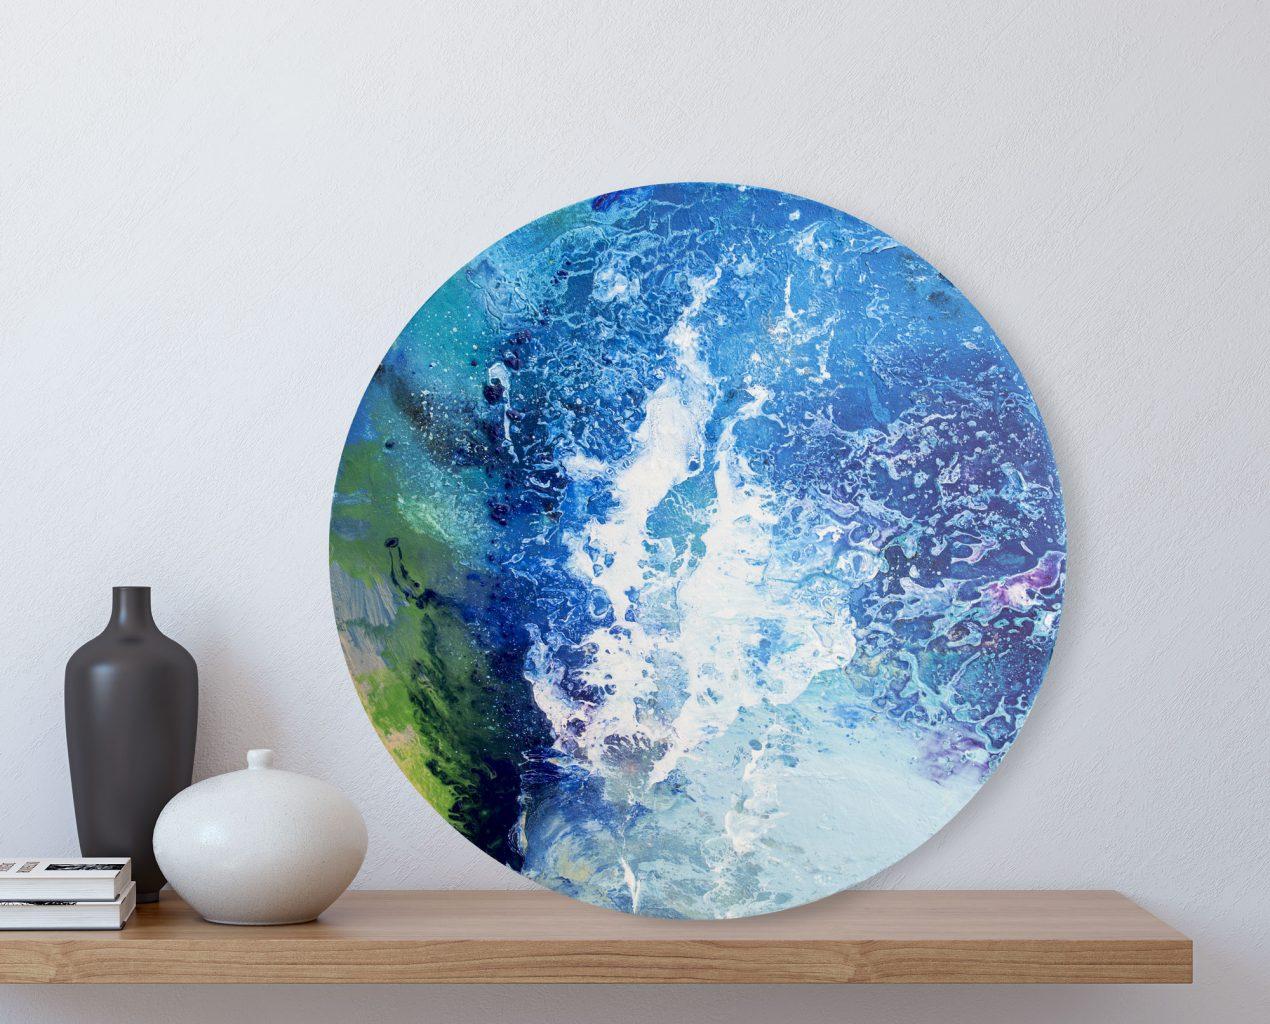 Sea Wave - original circular painting by Milena Gaytandzhieva. 40 cm